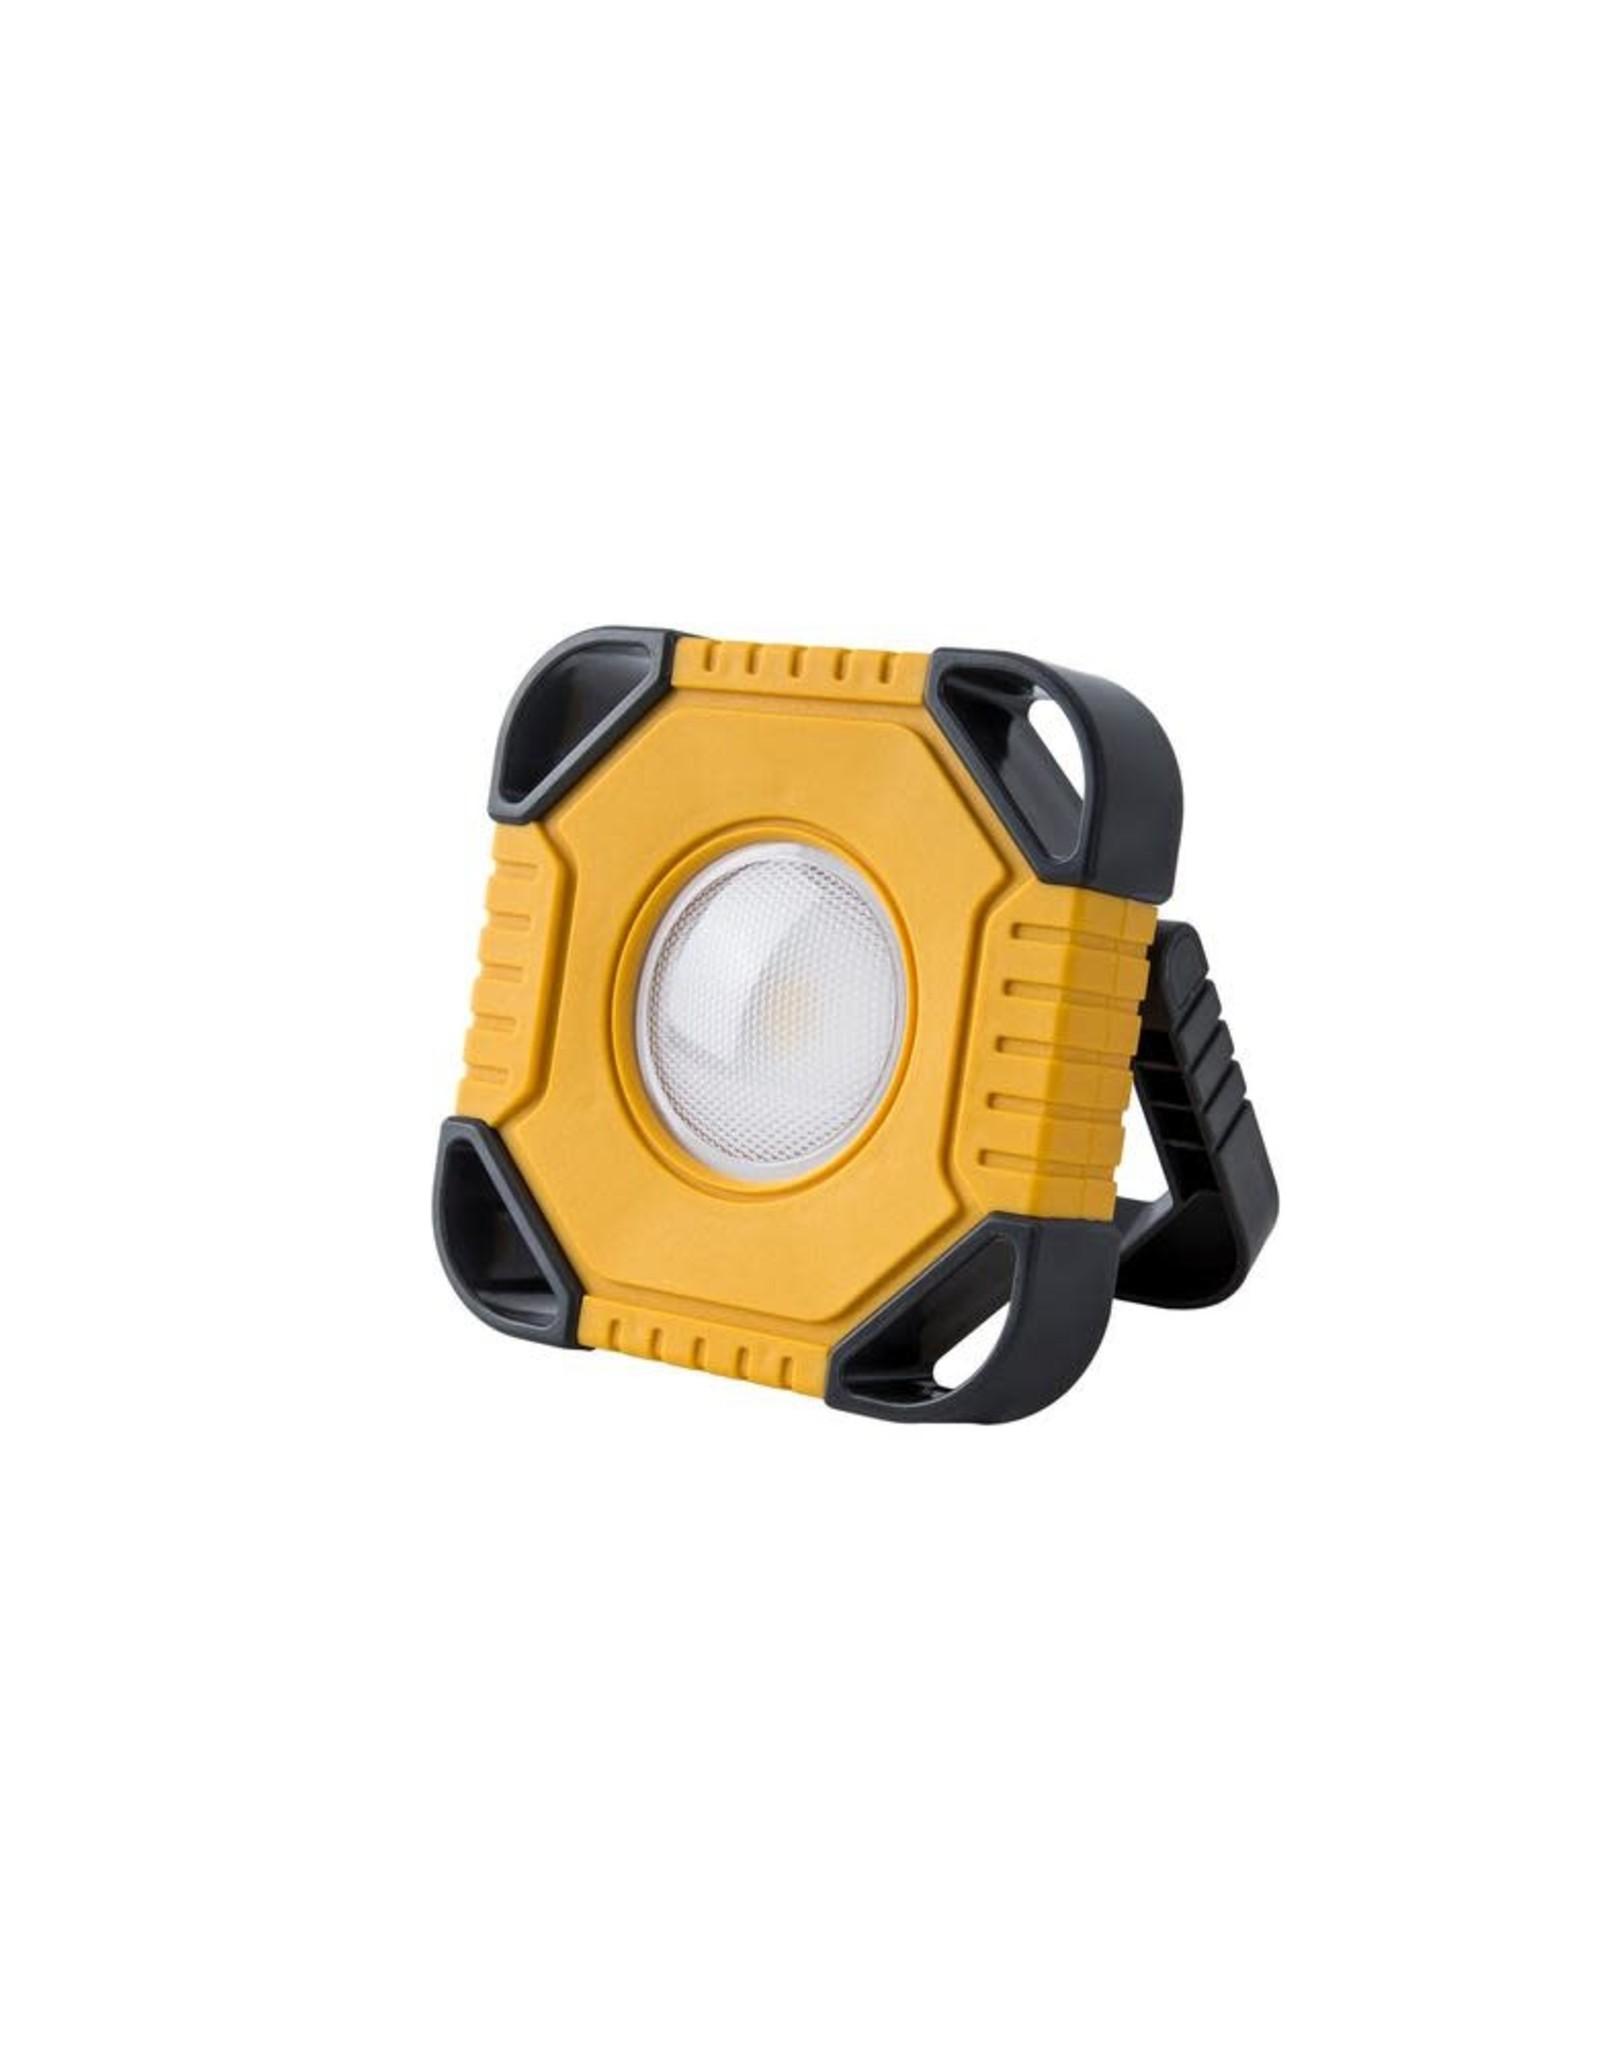 LUTEC USA LLC 500 Lumens Integrated LED Portable Work Light